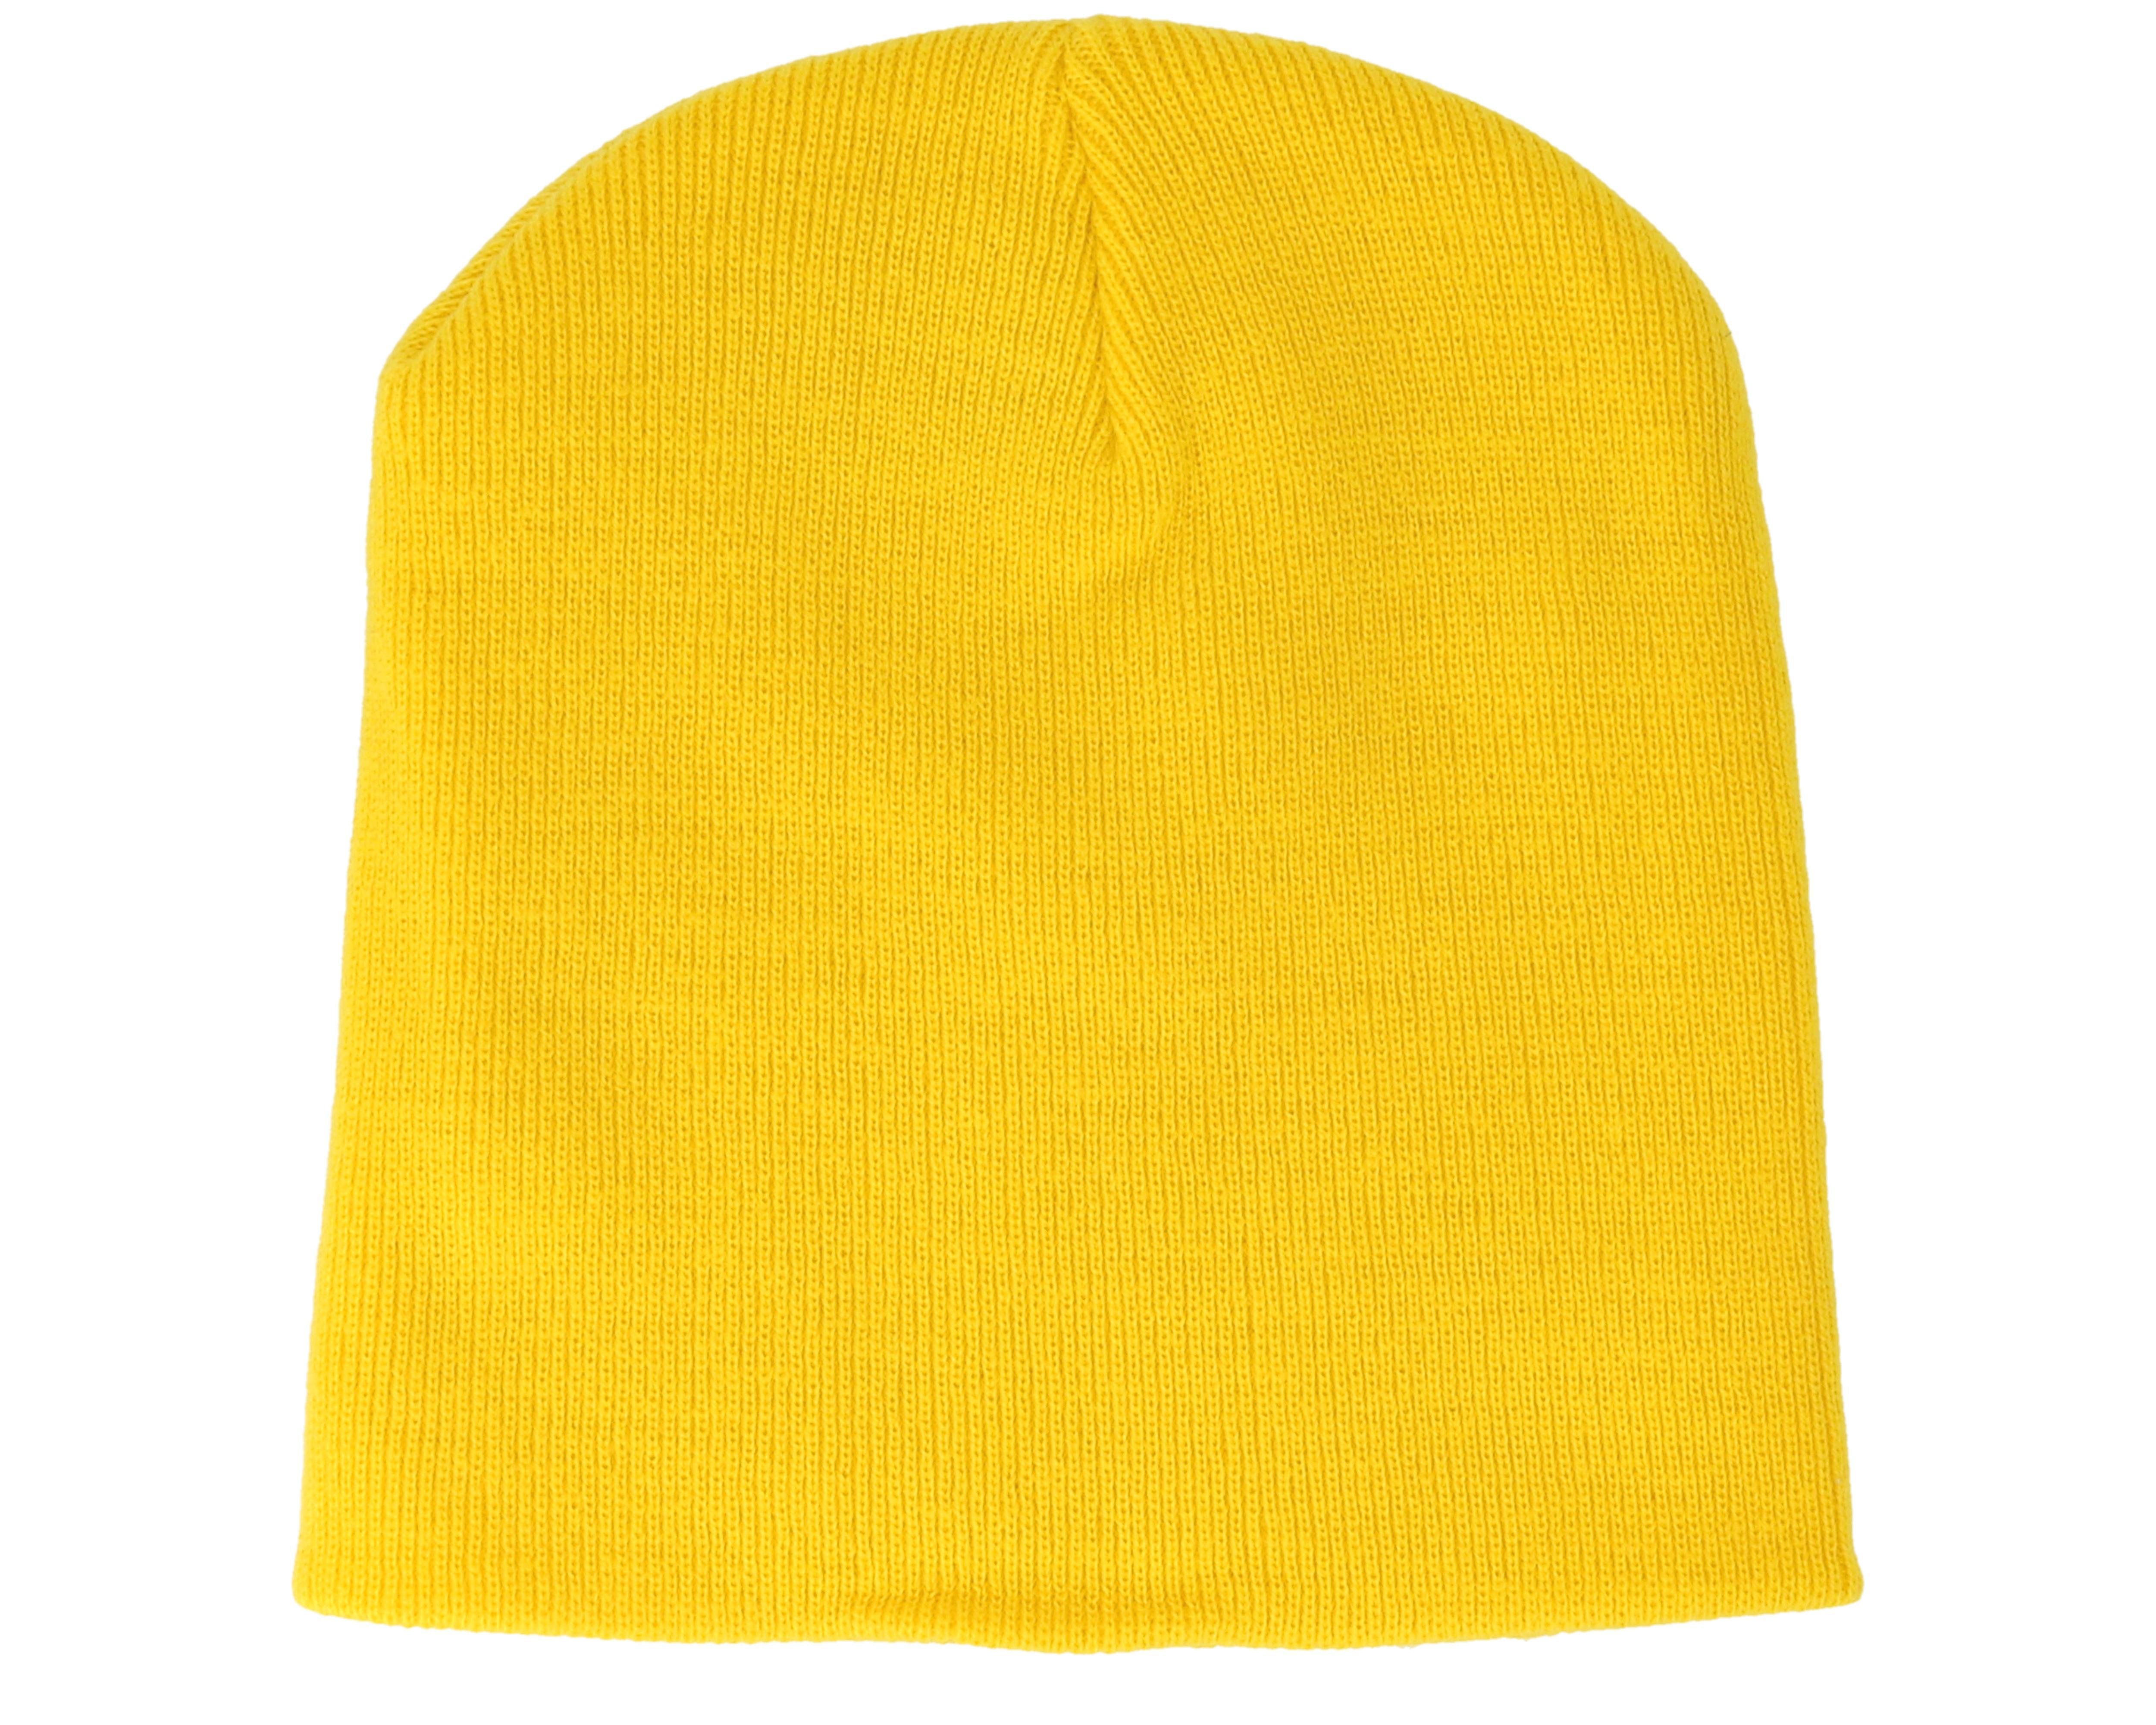 Original Pull-On Yellow Beanie - Beanie Basic beanies  18afe52ccf15